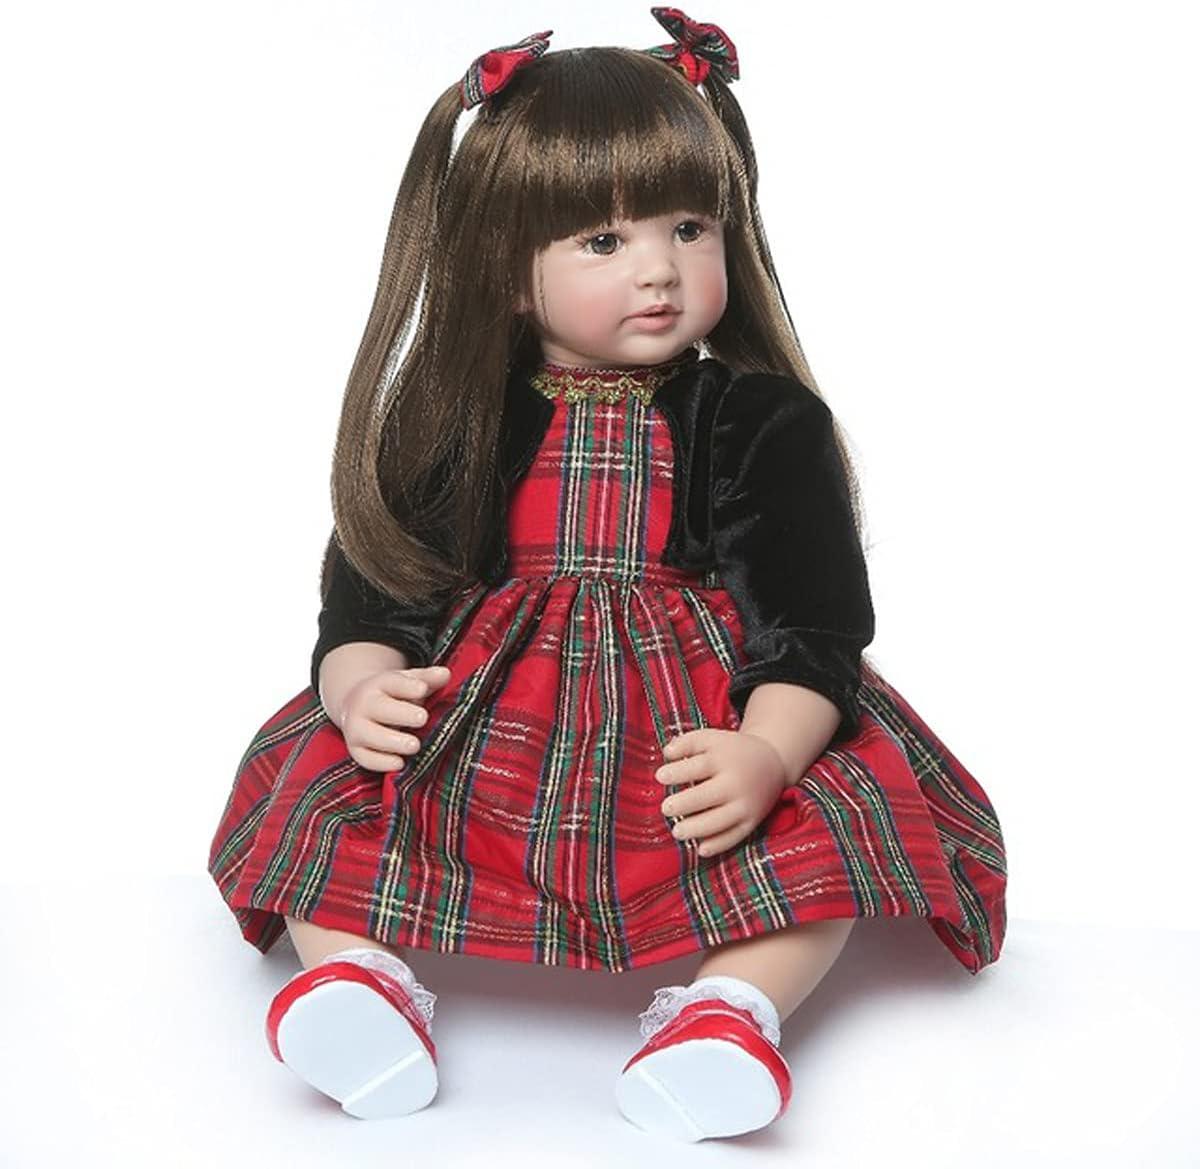 TERABITHIA 24inch Soft Big Selling rankings Max 86% OFF Size Princess Reborn Toddler Dol 60cm